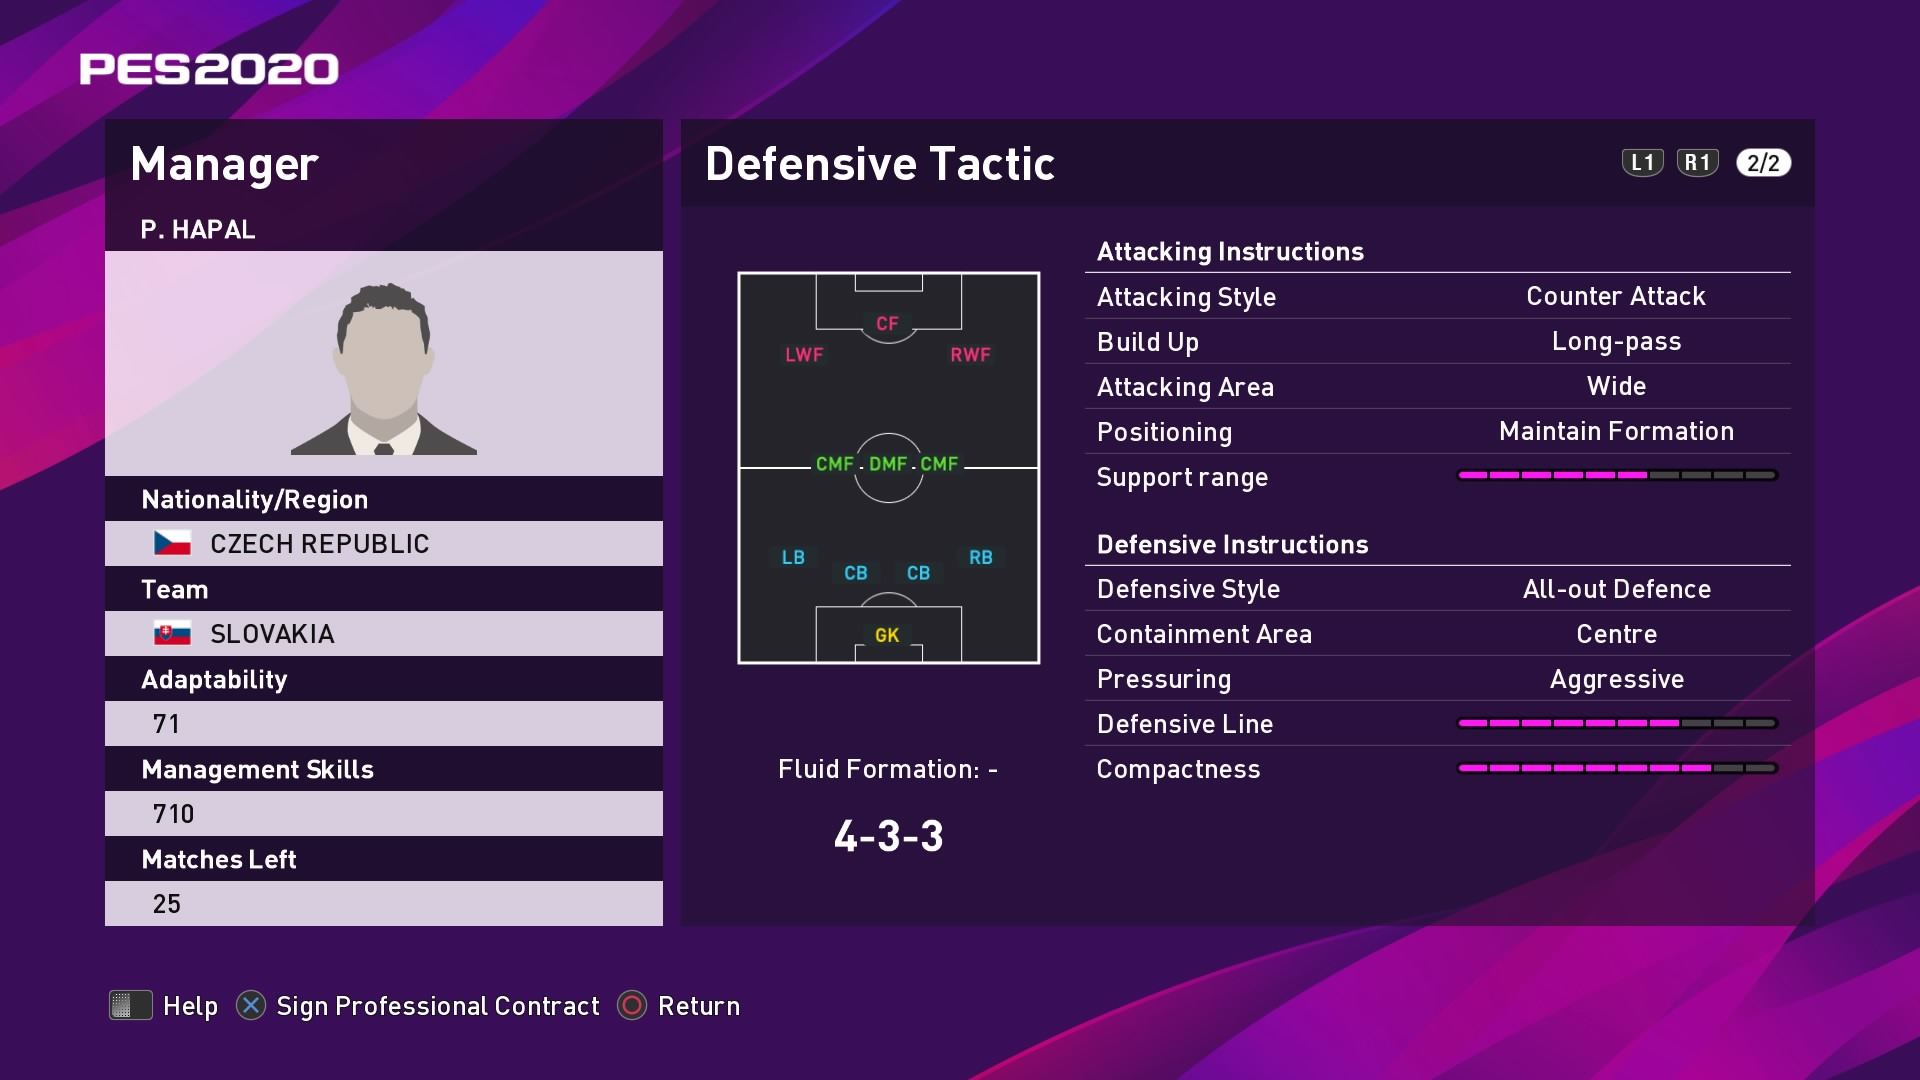 P. Hapal (Pavel Hapal) Defensive Tactic in PES 2020 myClub